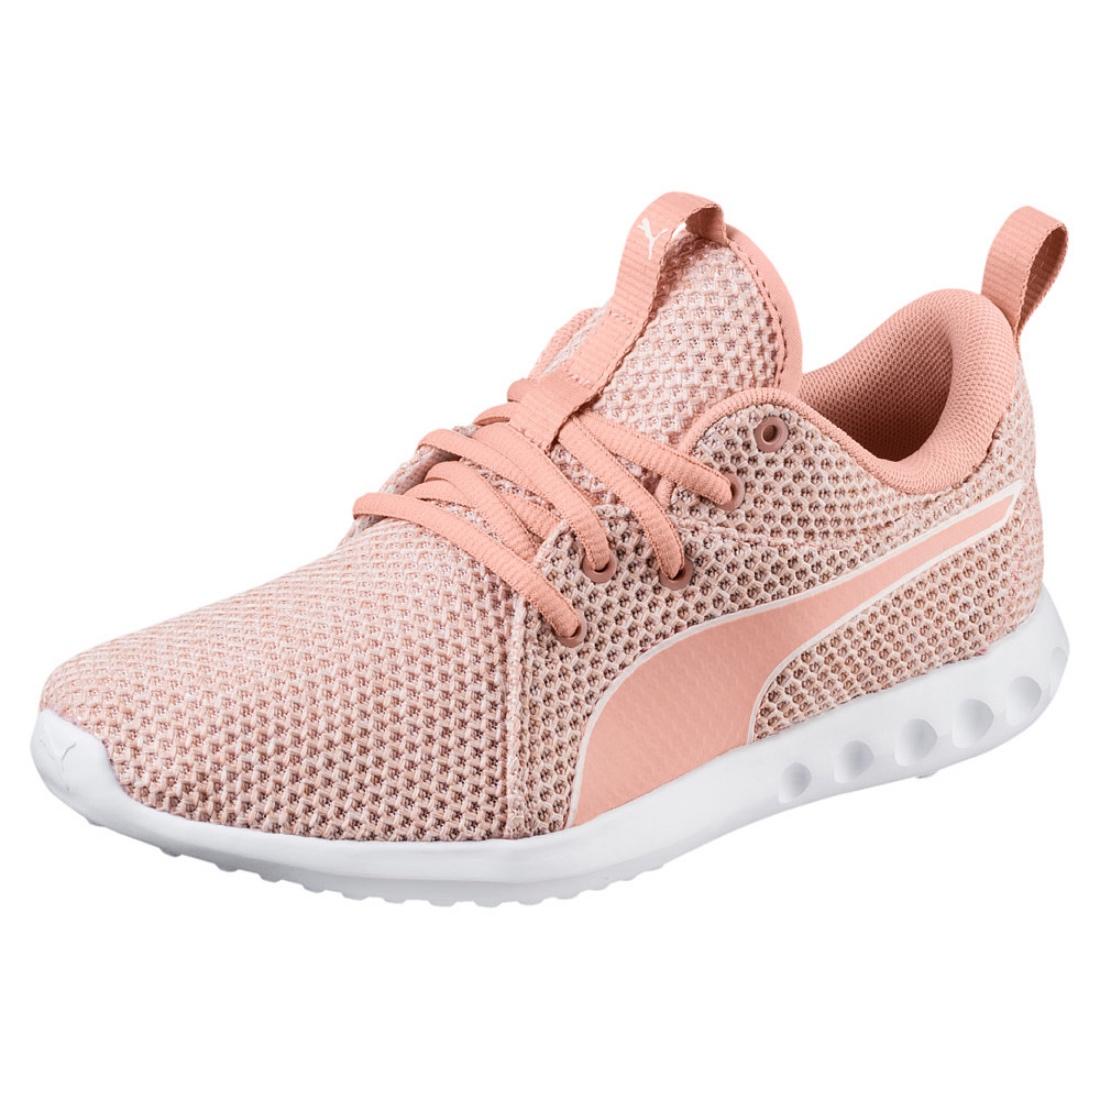 Puma Carson 2 Nature Knit Wn's Damen Laufschuhe Sneaker